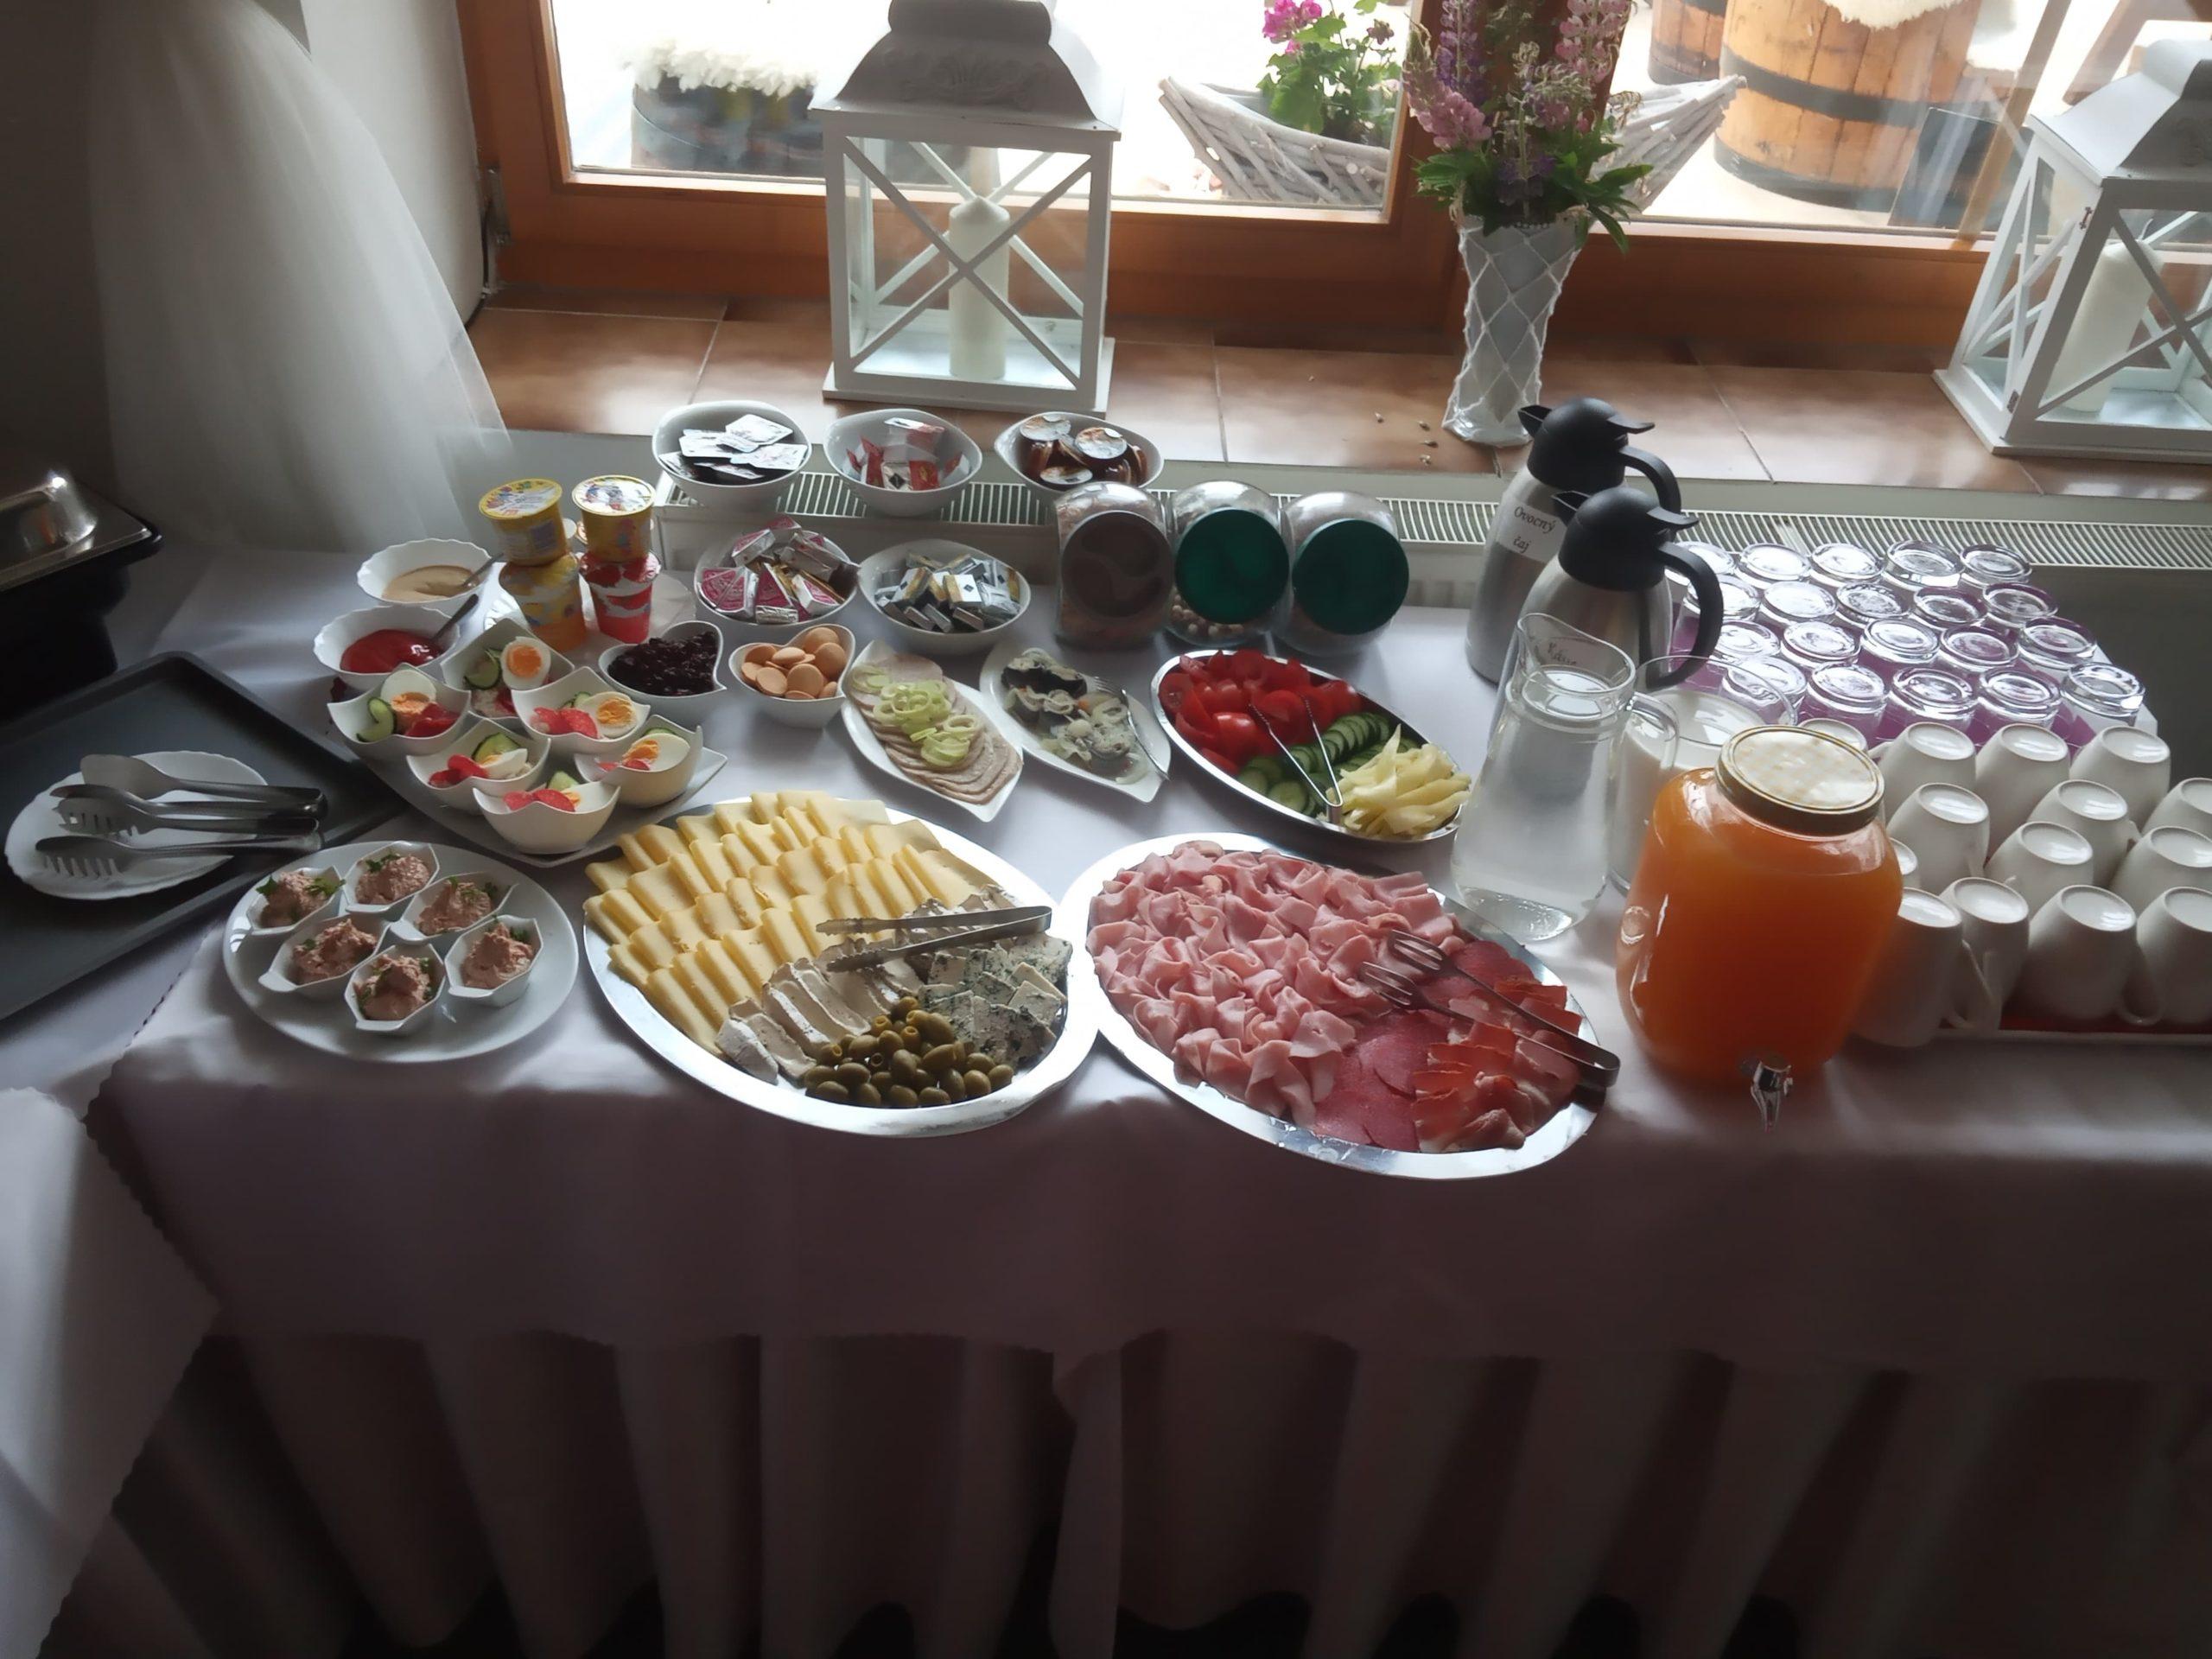 Raňajky formou bufetu